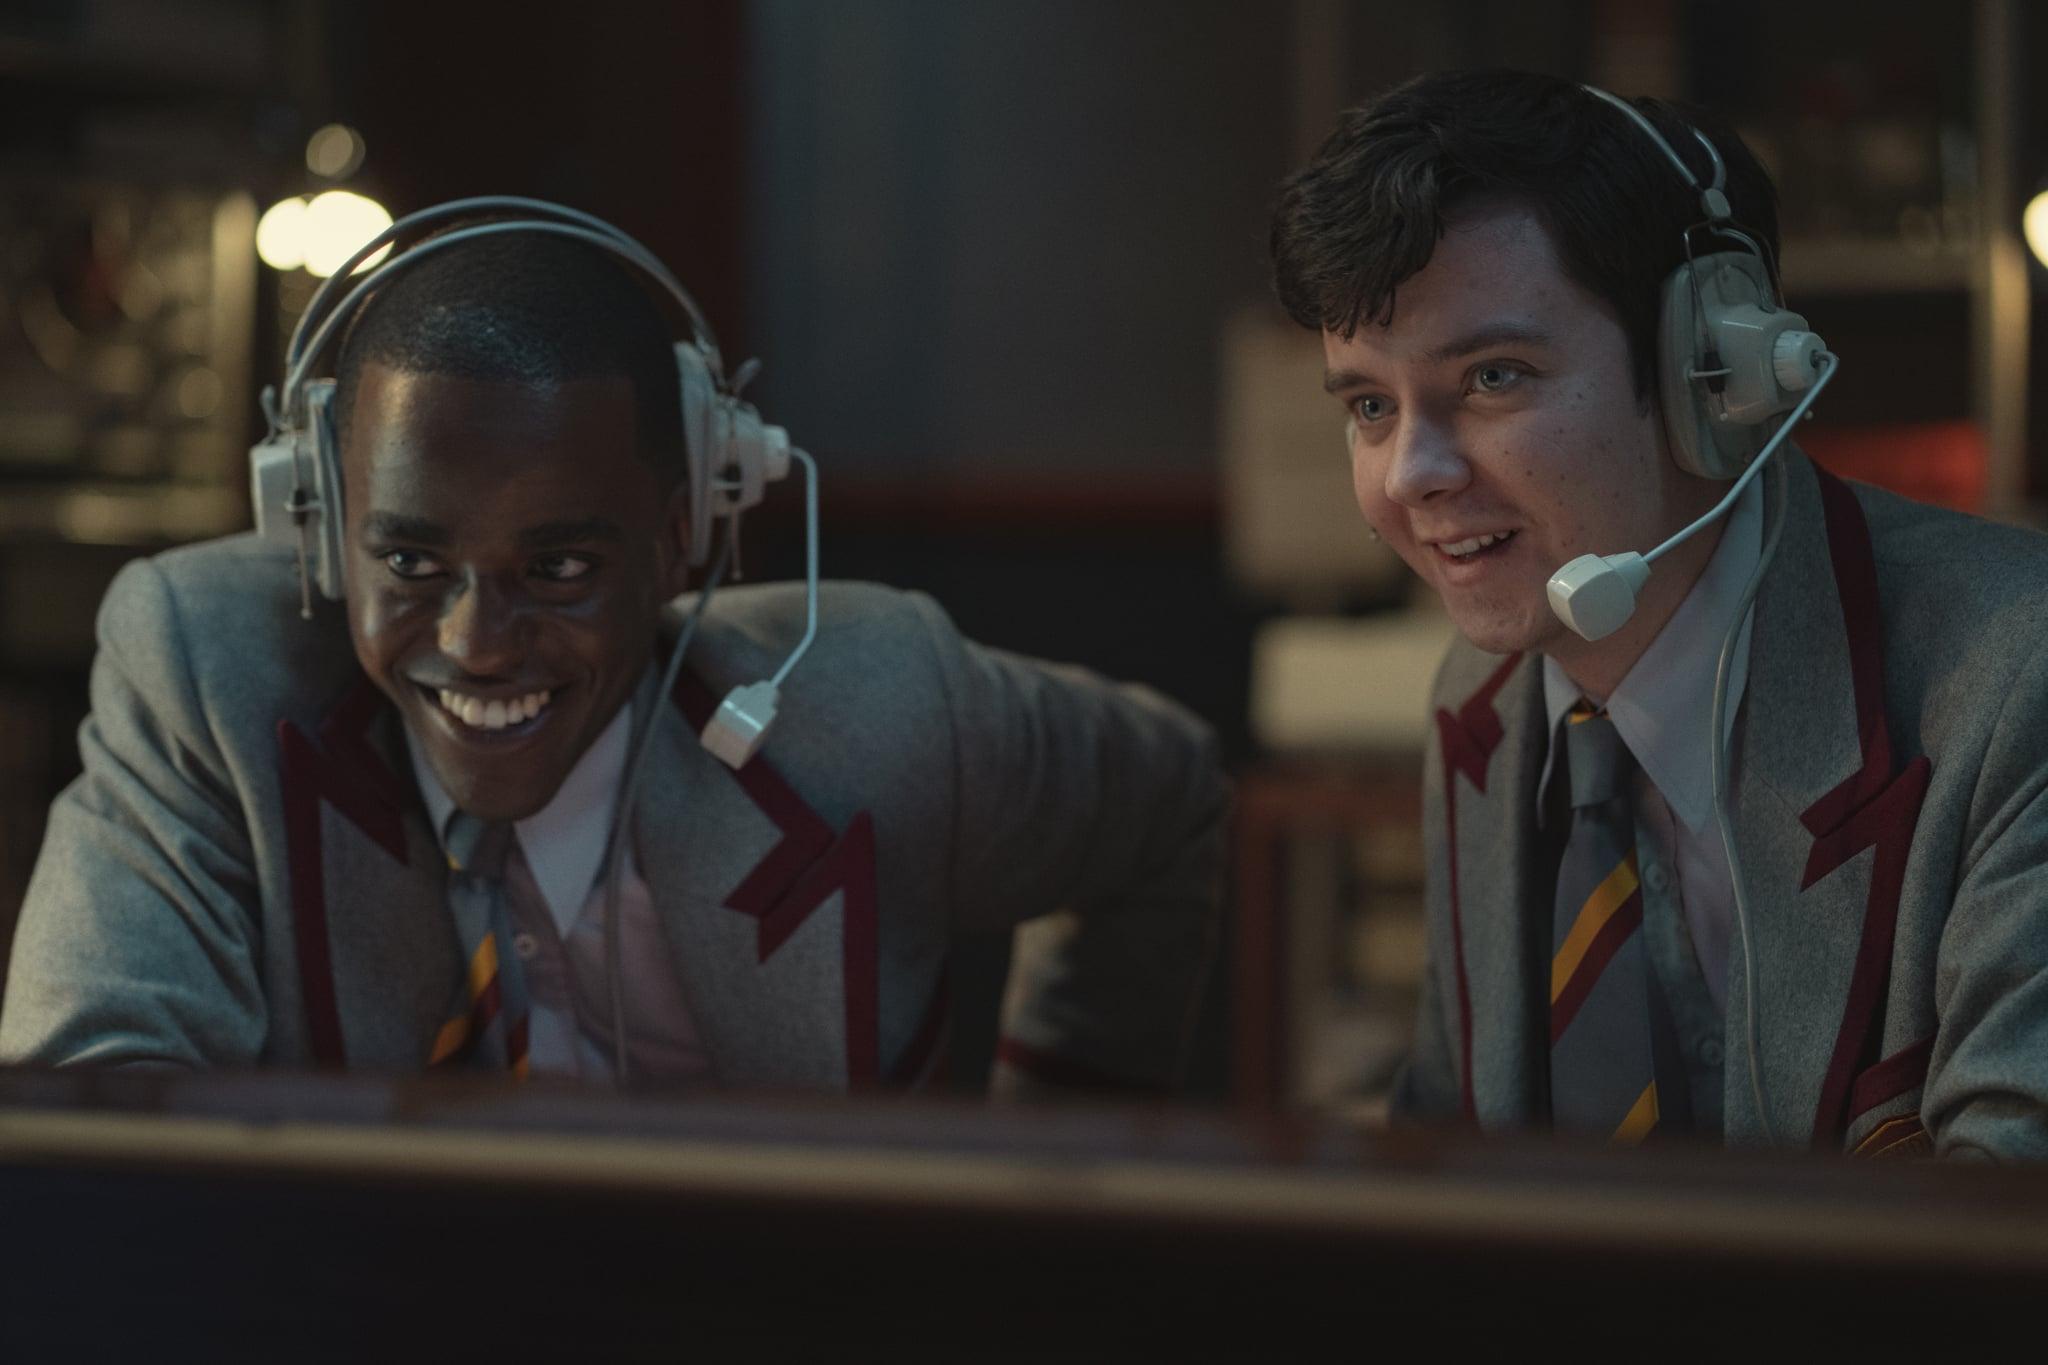 Sex Education Season 3.  Ncuti Gatwa as Eric Effiong, Asa Butterfield as Otis Milburn in Episode 7 of Sex Education Season 3. Cr. Sam Taylor/NETFLIX © 2020